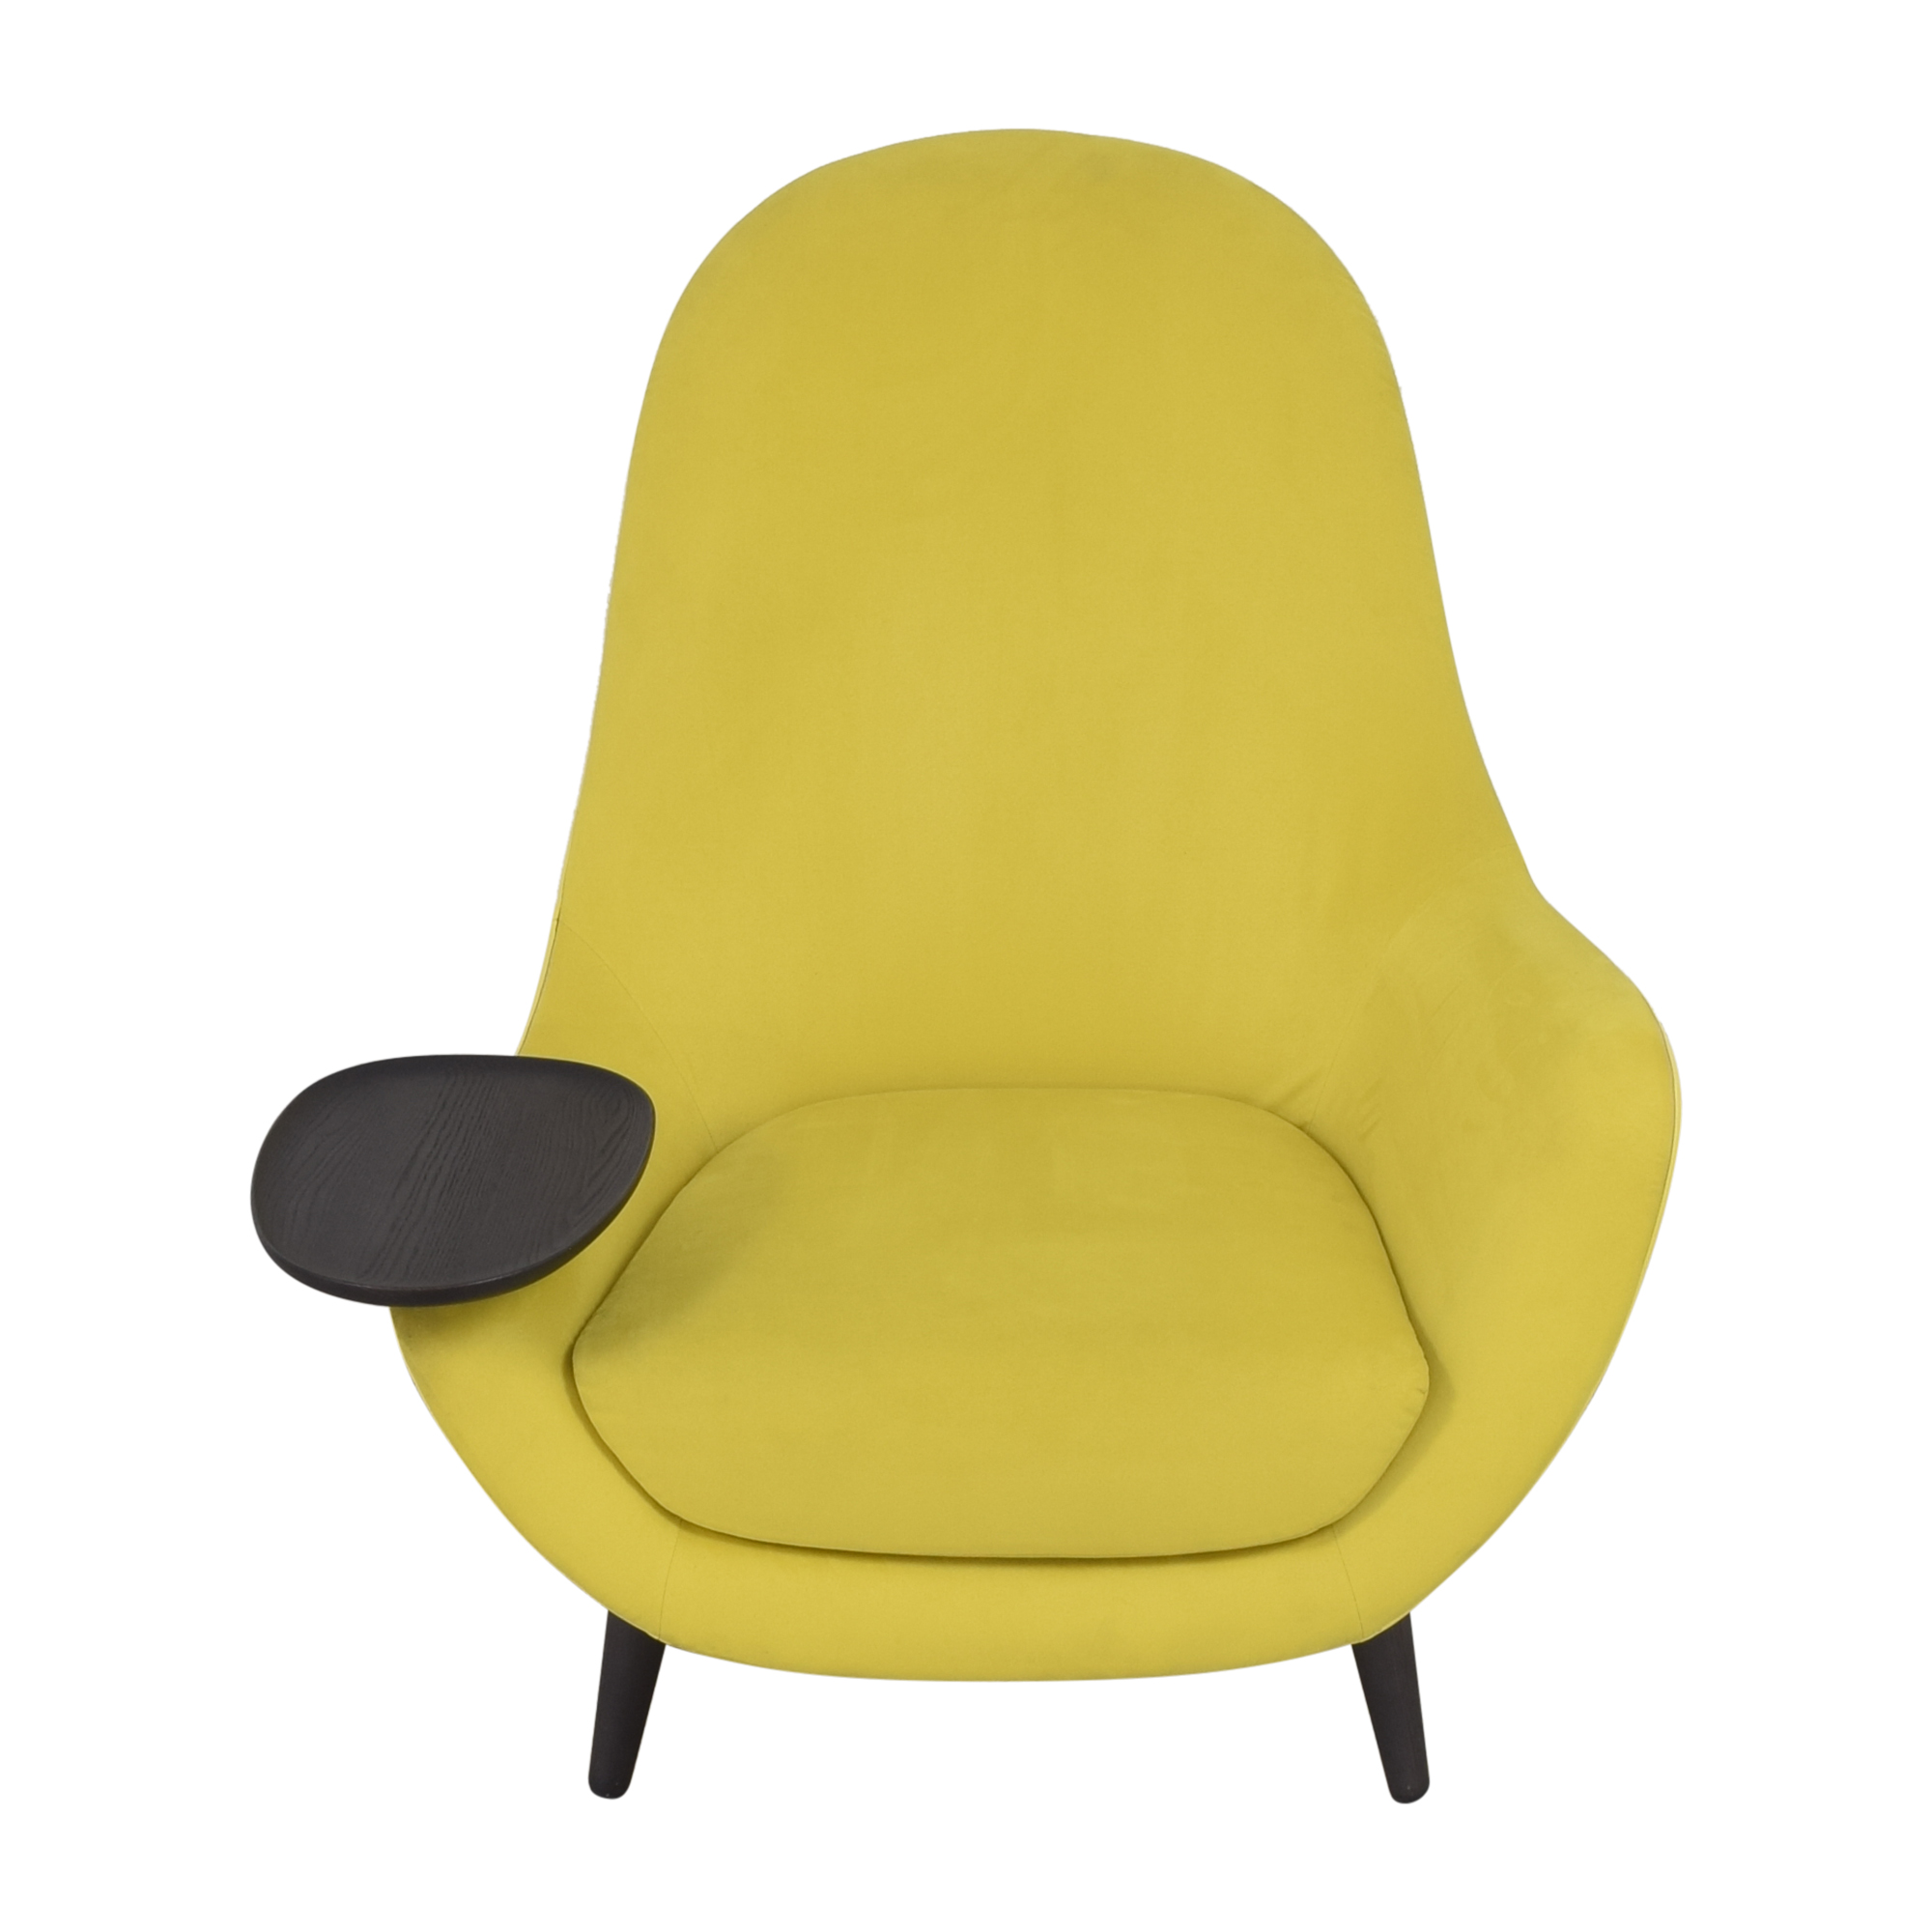 Poliform Poliform Mad King Chair ct